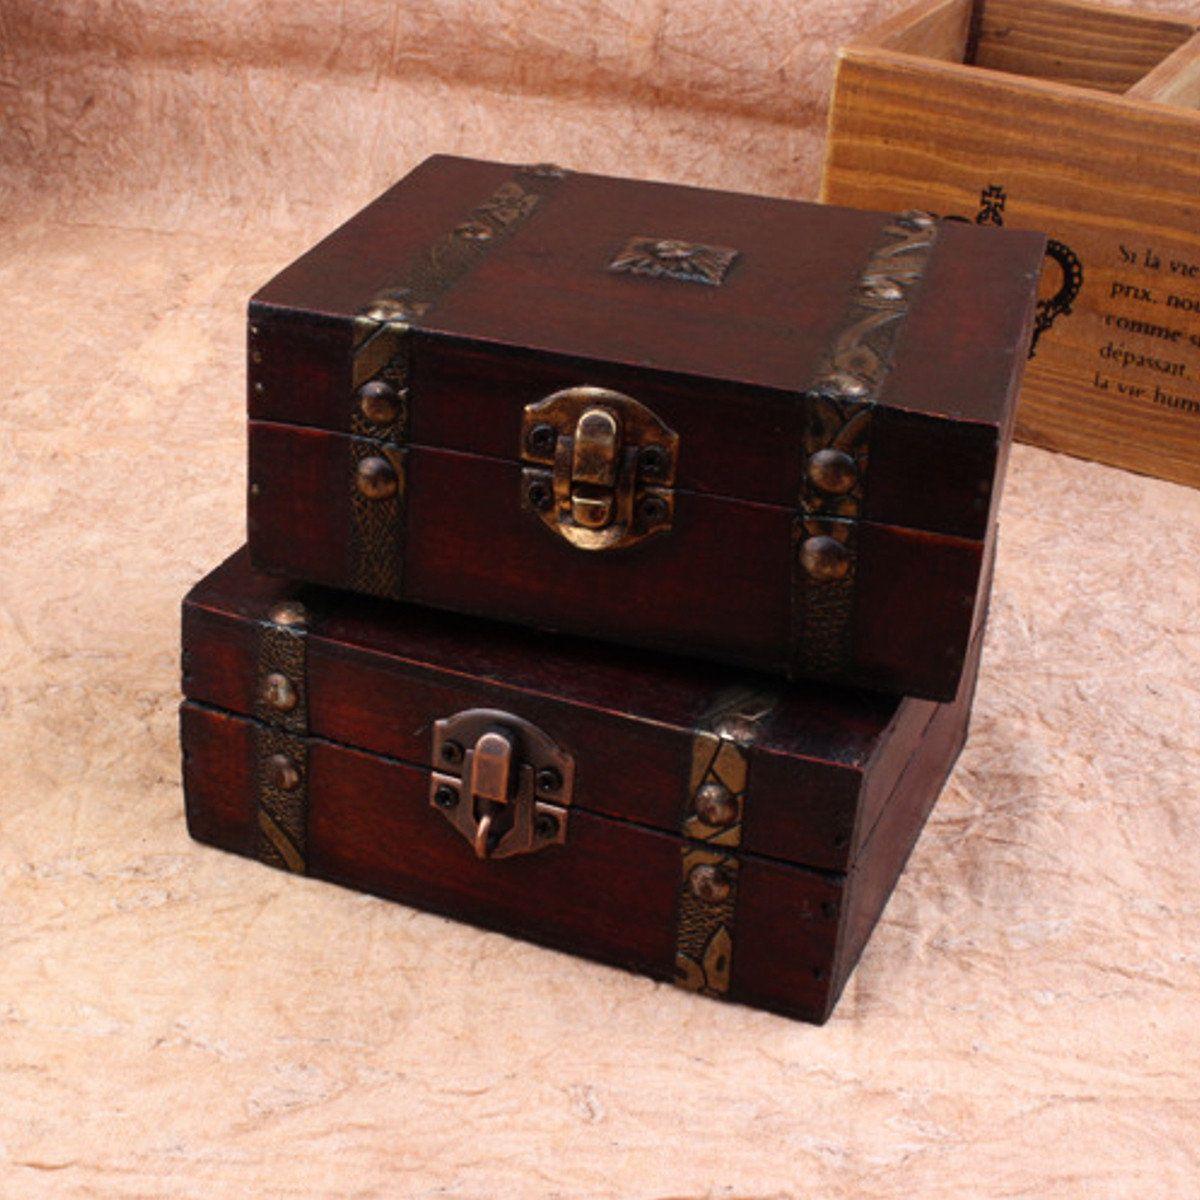 Vintage Jewelry Lock Necklace Bracelet Storage Organizer Woodens Cases  Gift Box